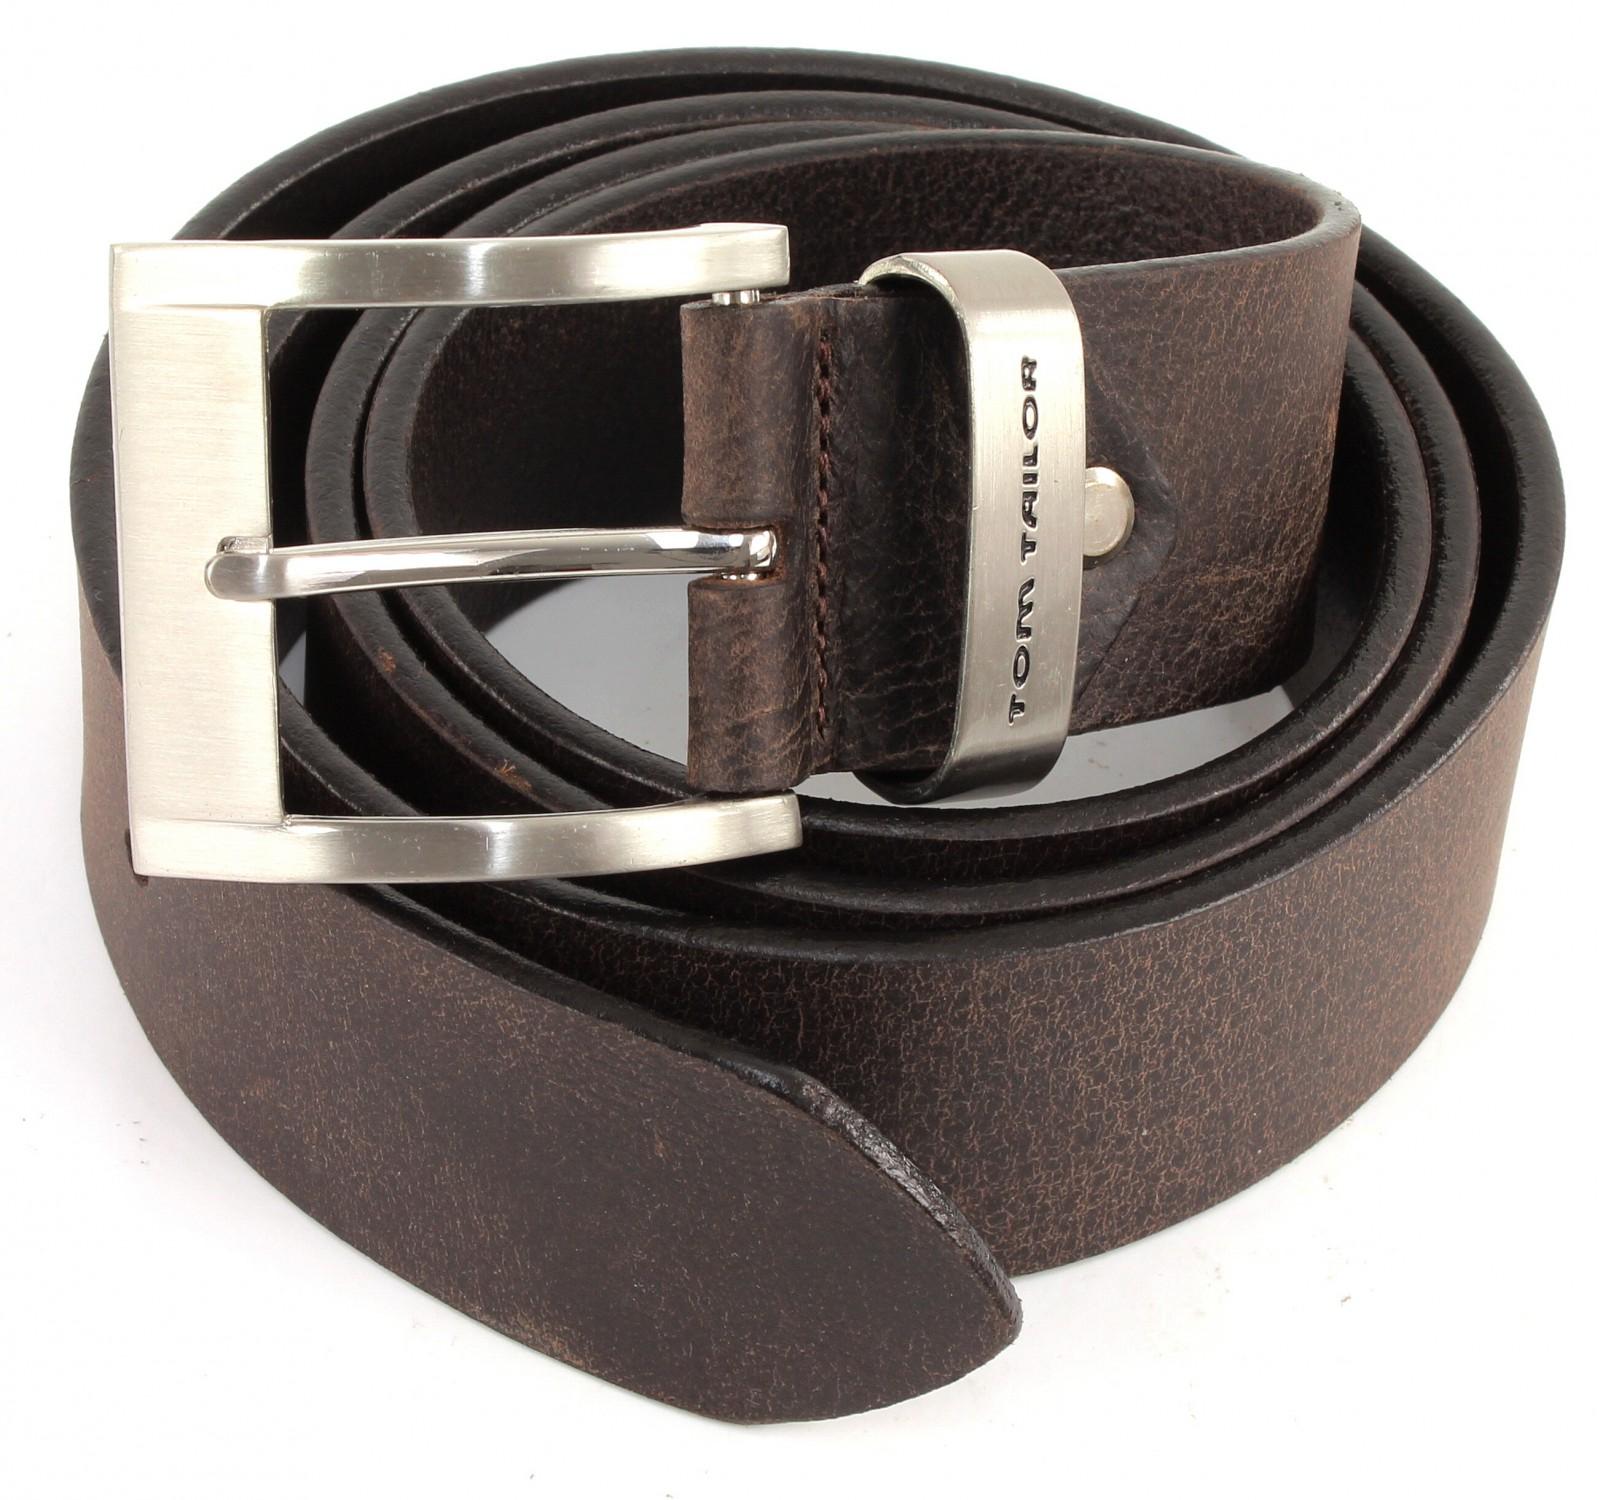 TOM TAILOR Belt TG1165H31 W105 Dark Brown